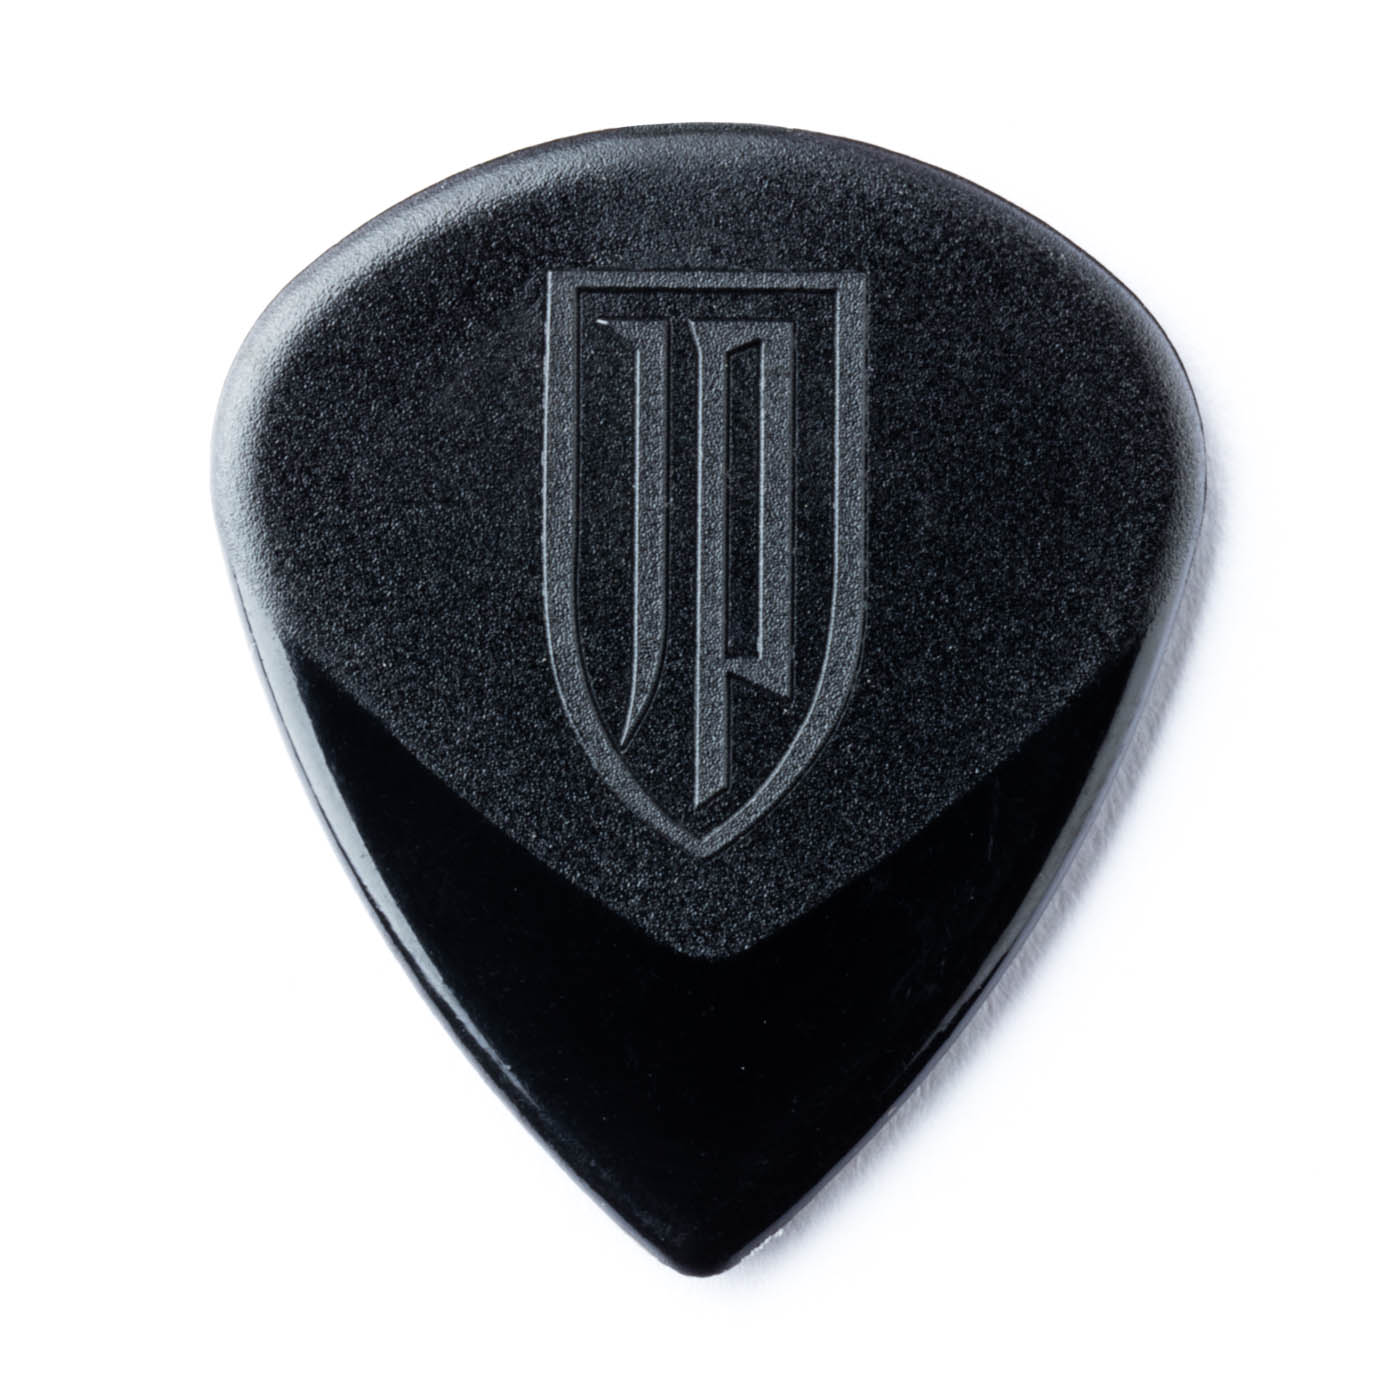 DUNLOP Médiators John Petrucci Signature Jazz III x 6